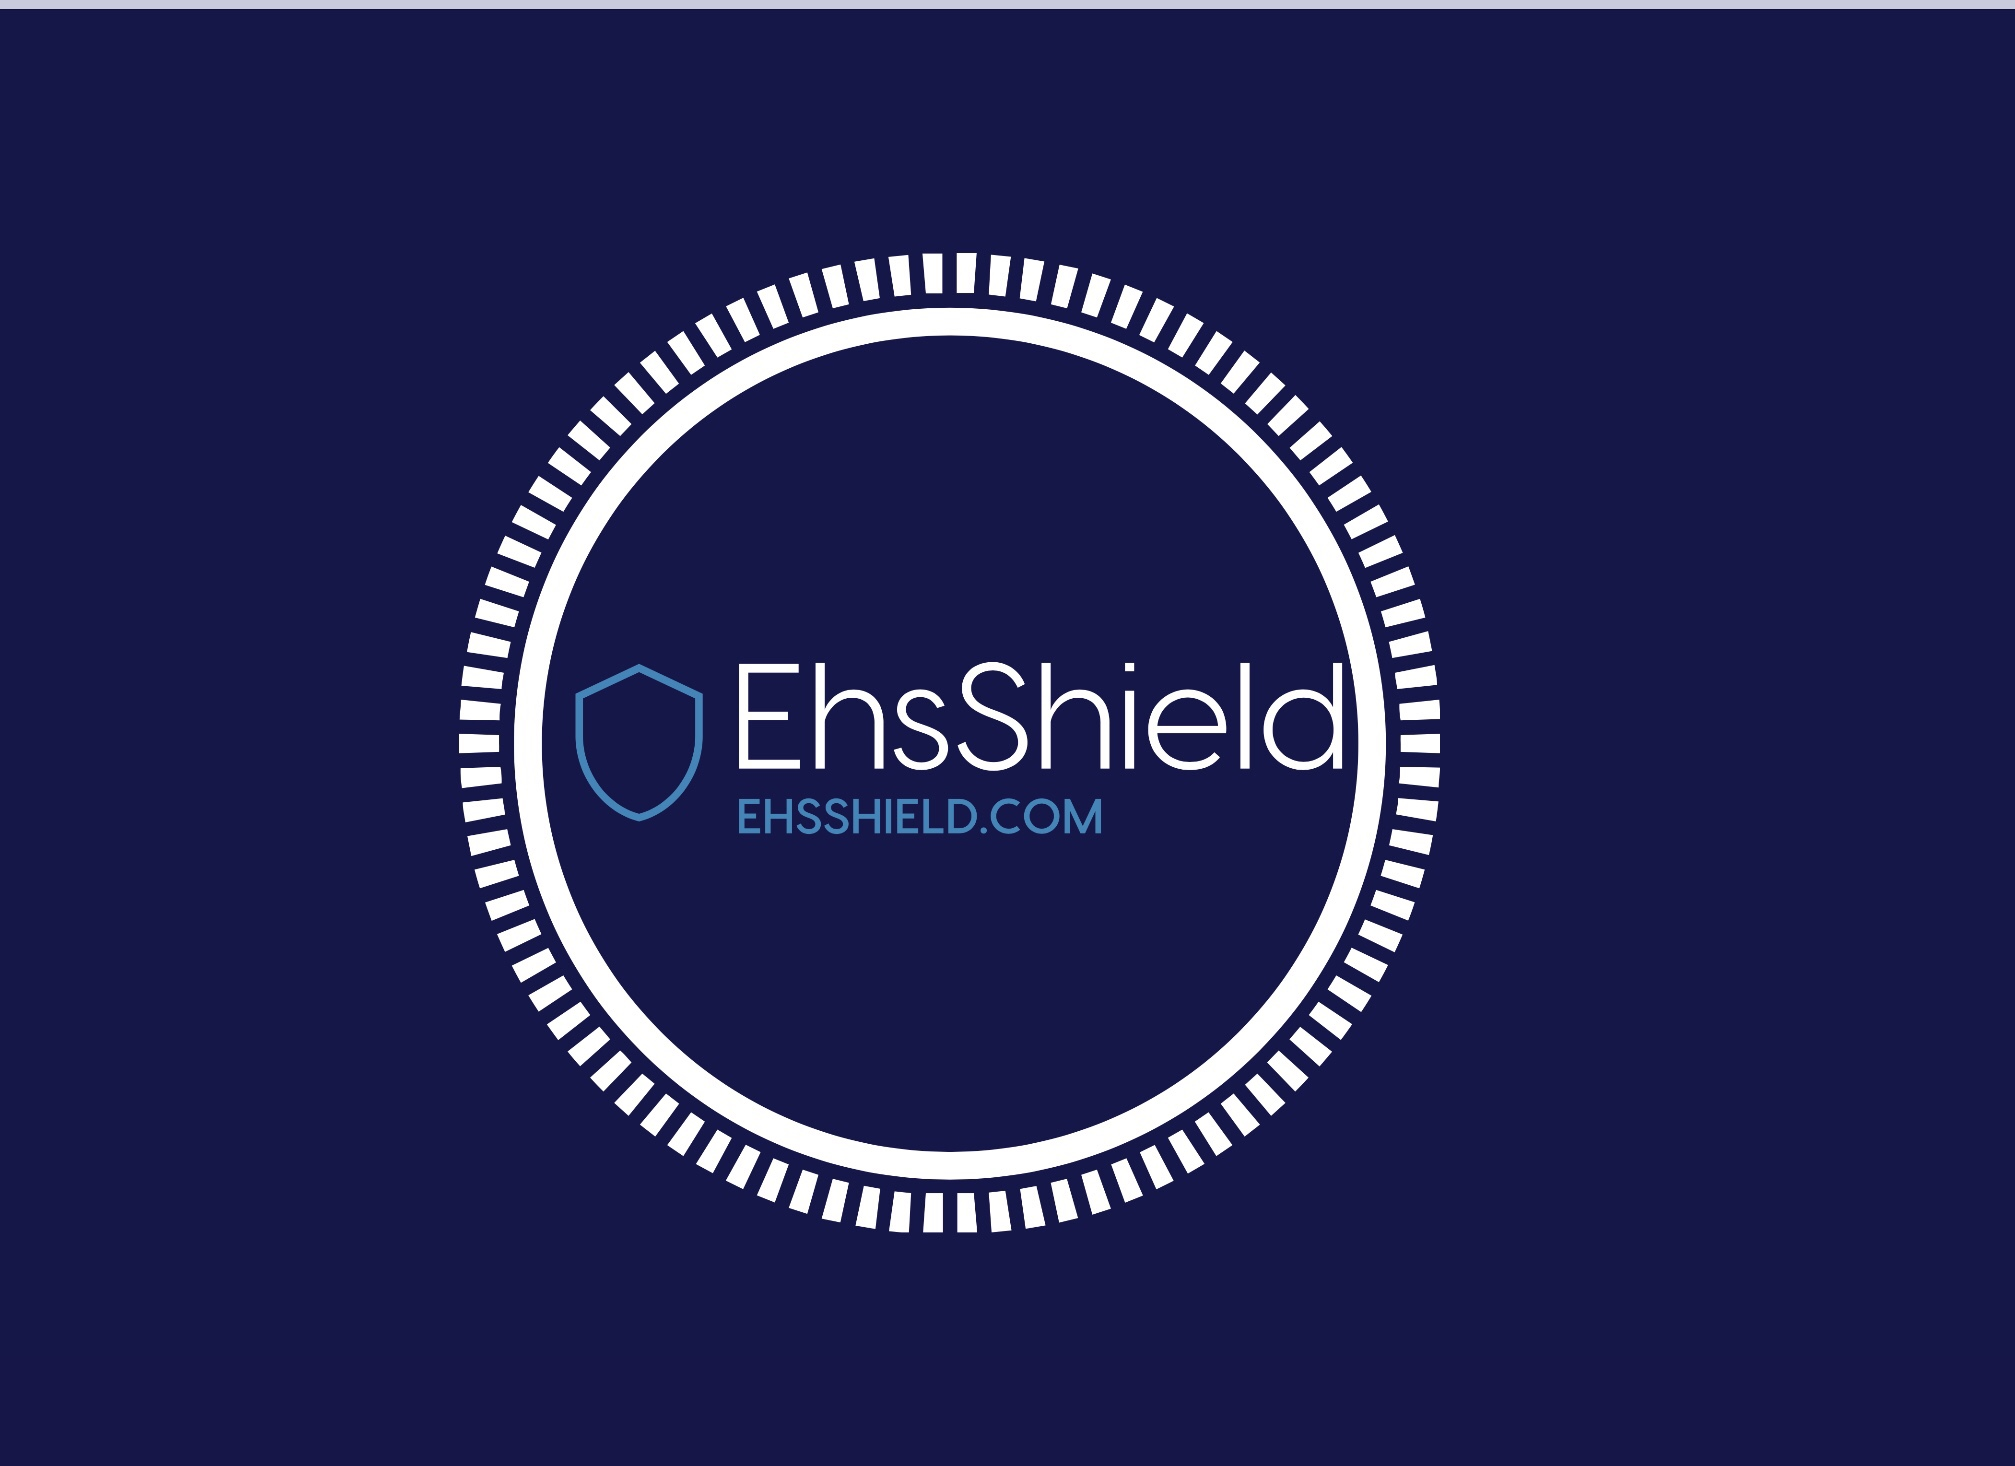 Ehsshield